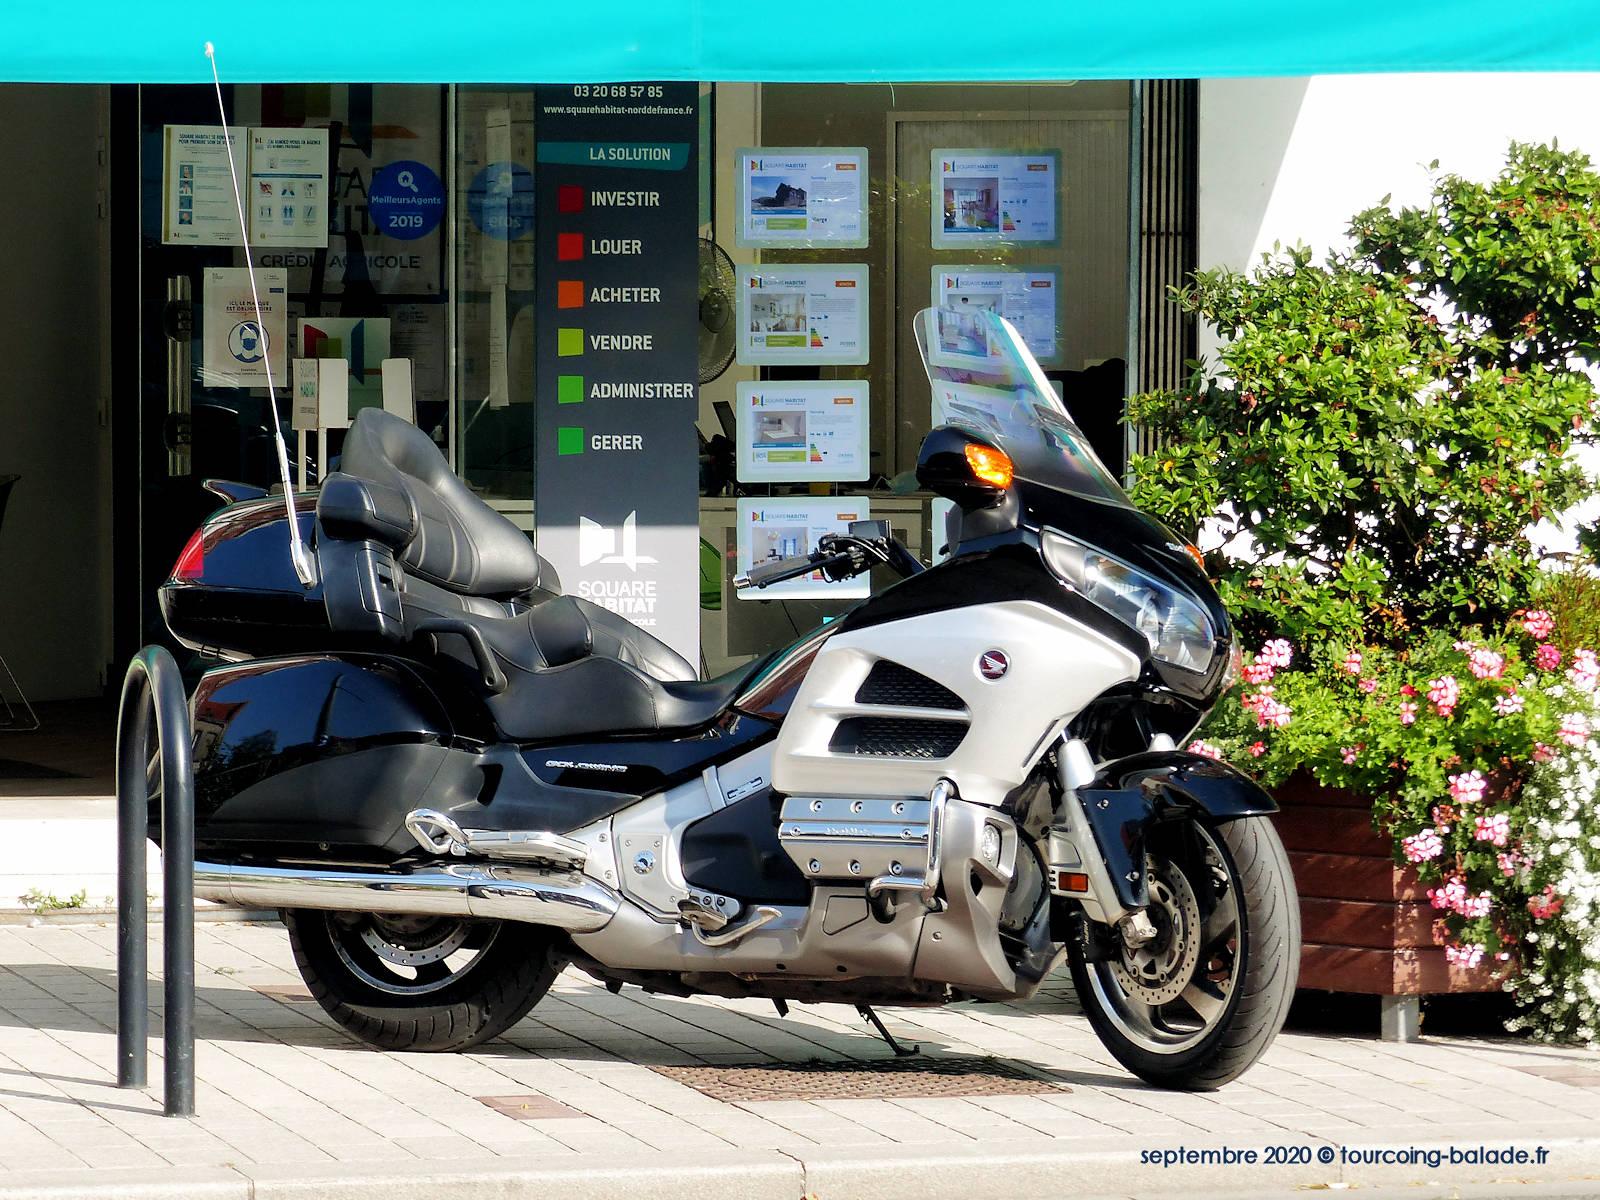 Moto Honda Goldwing 1800 - Tourcoing 2020